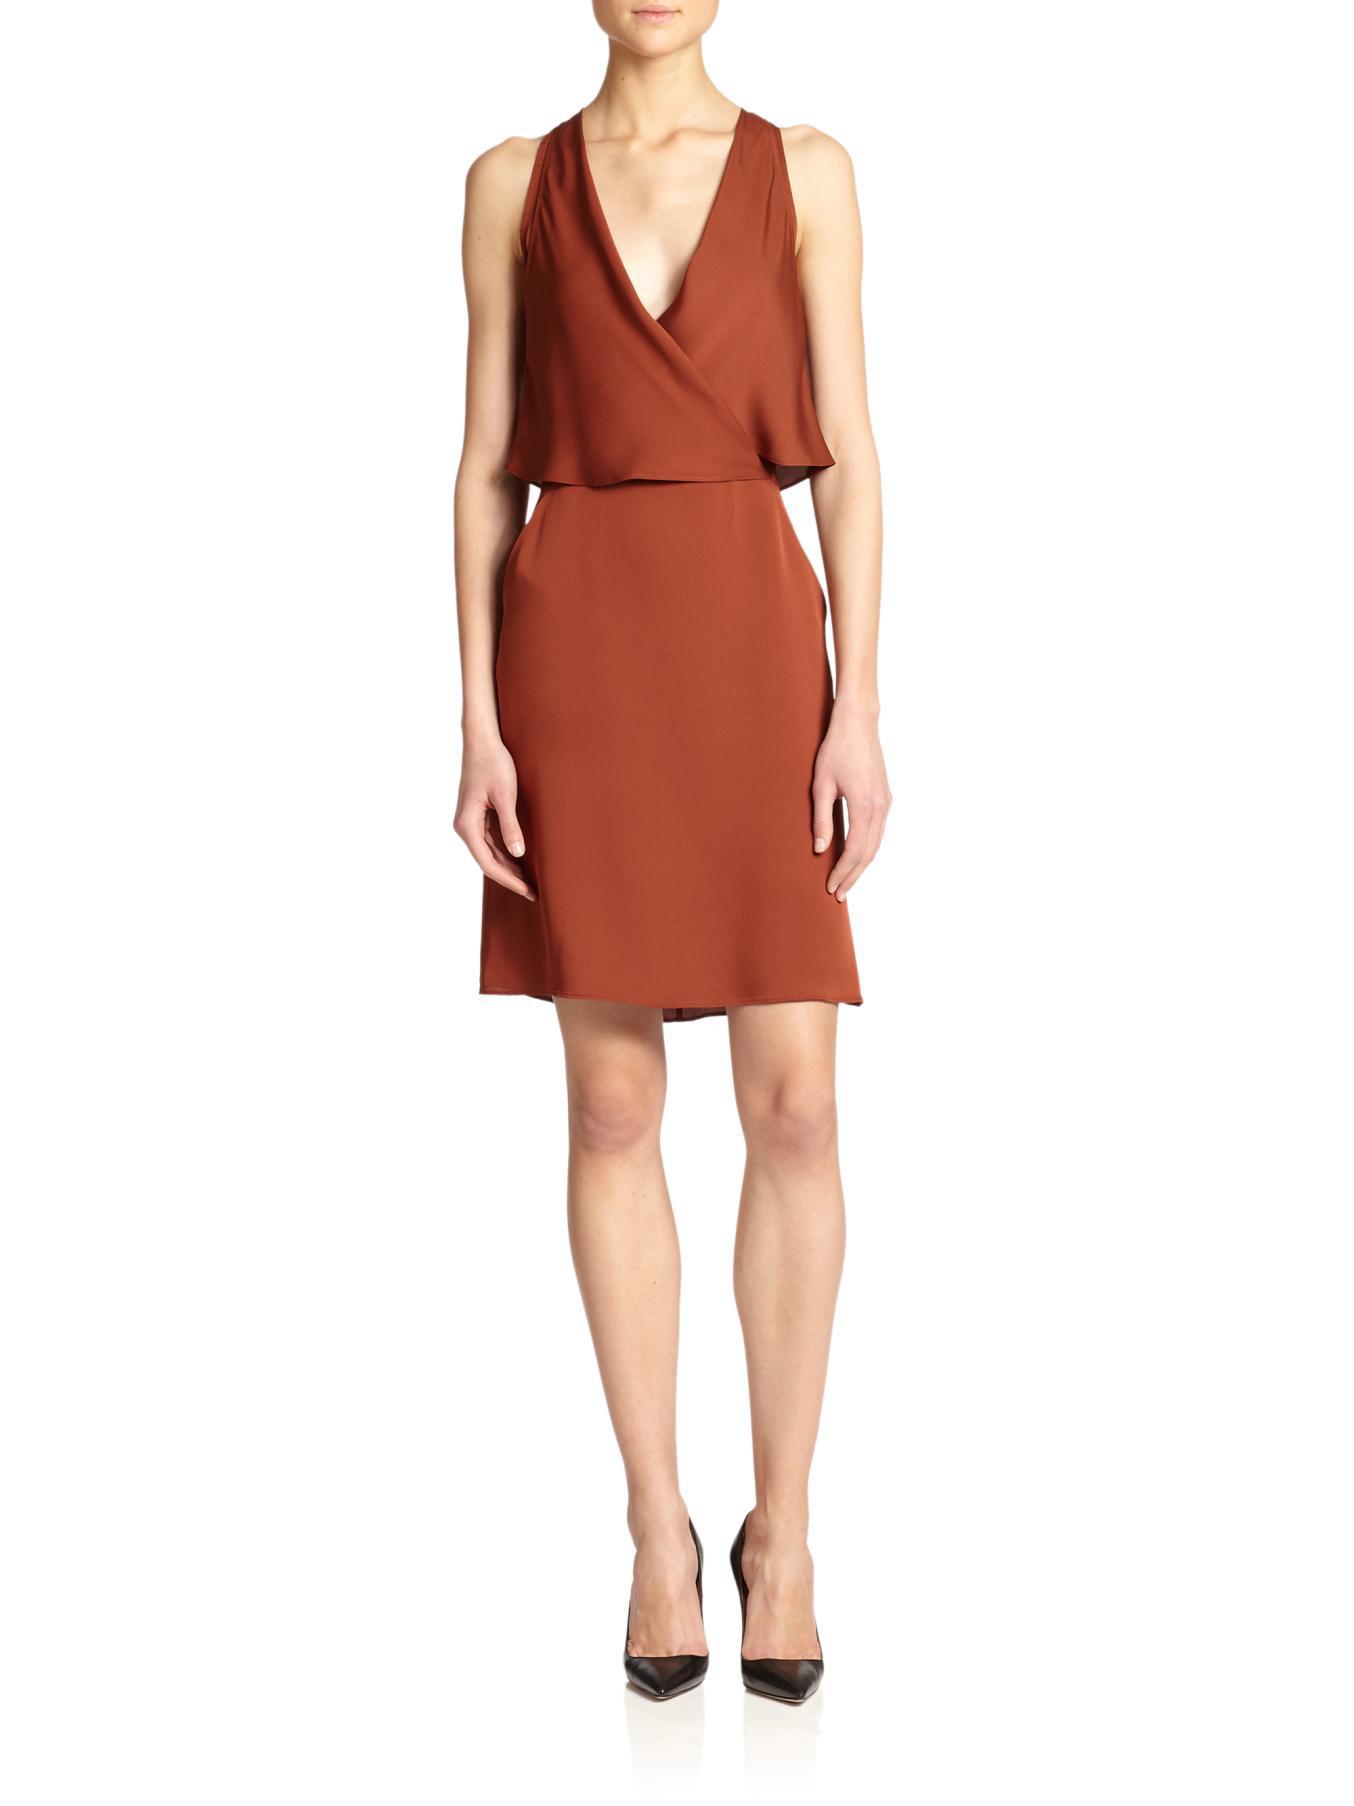 Theory Osteen Silk Surplice Dress in Brown | Lyst